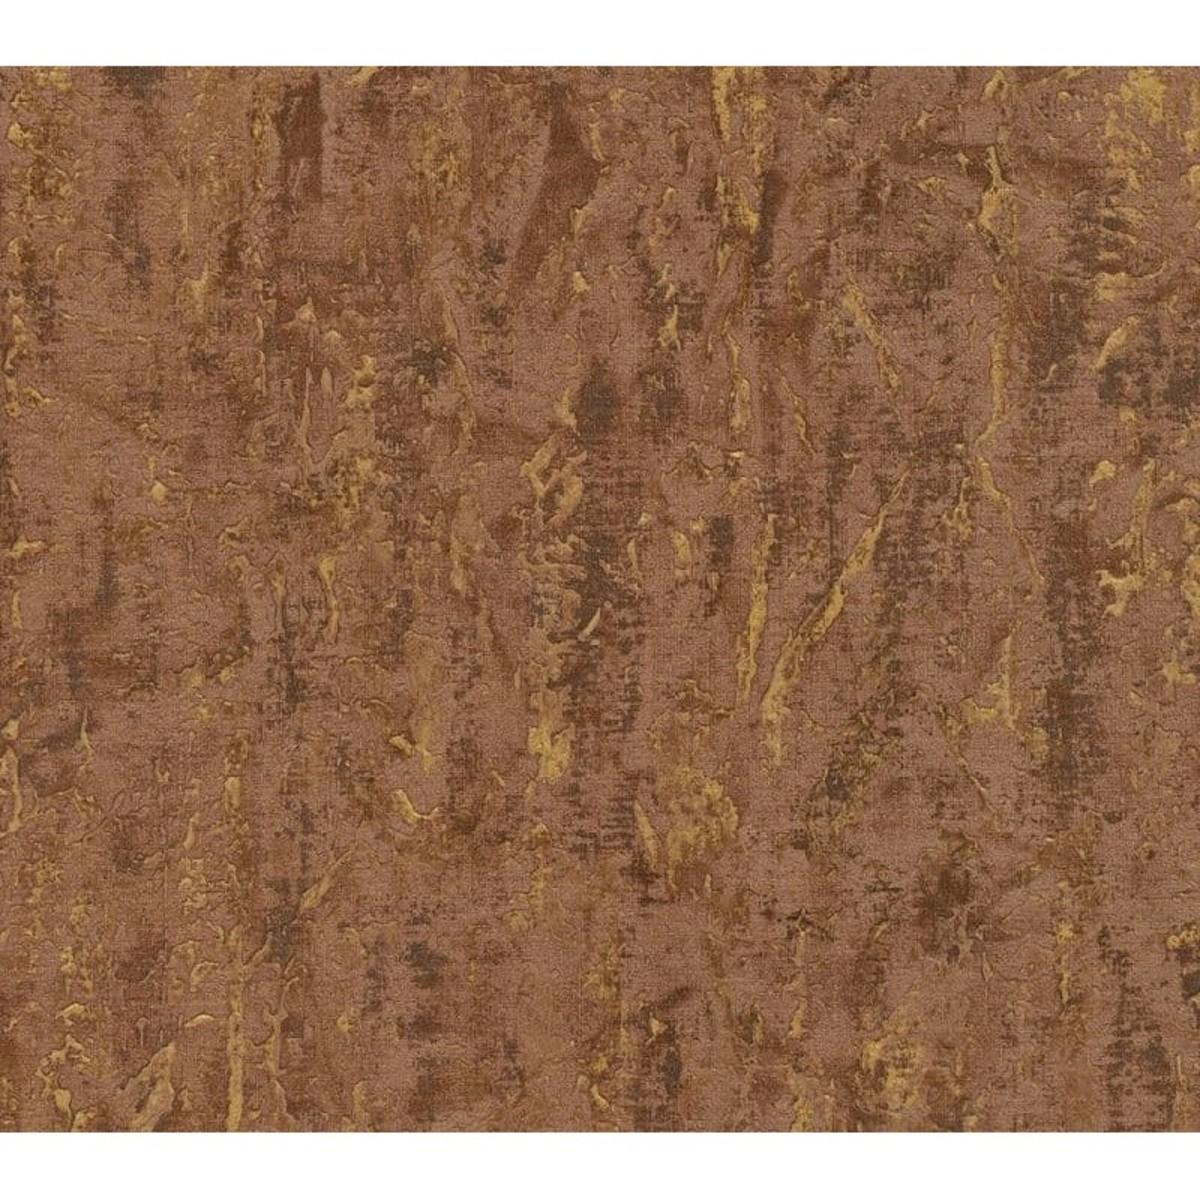 Обои флизелиновые Limonta Italian Wall Couture AURUM коричневые 1.06 м 56309